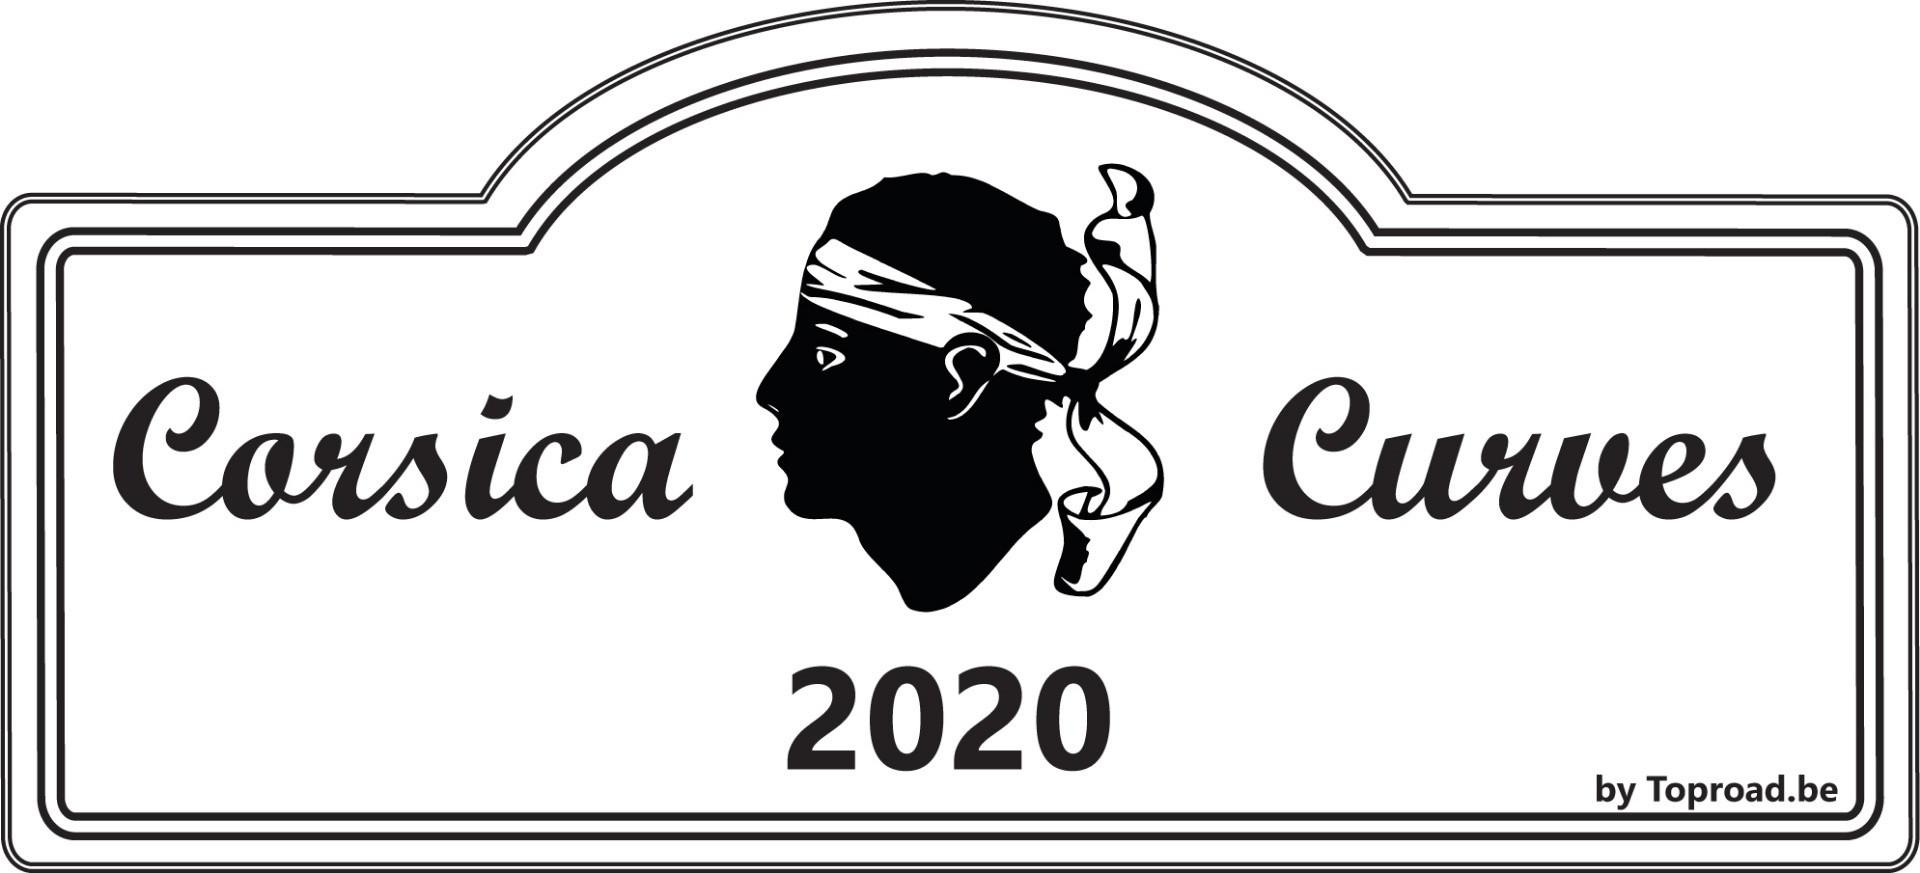 CORSICA CURVES 2020